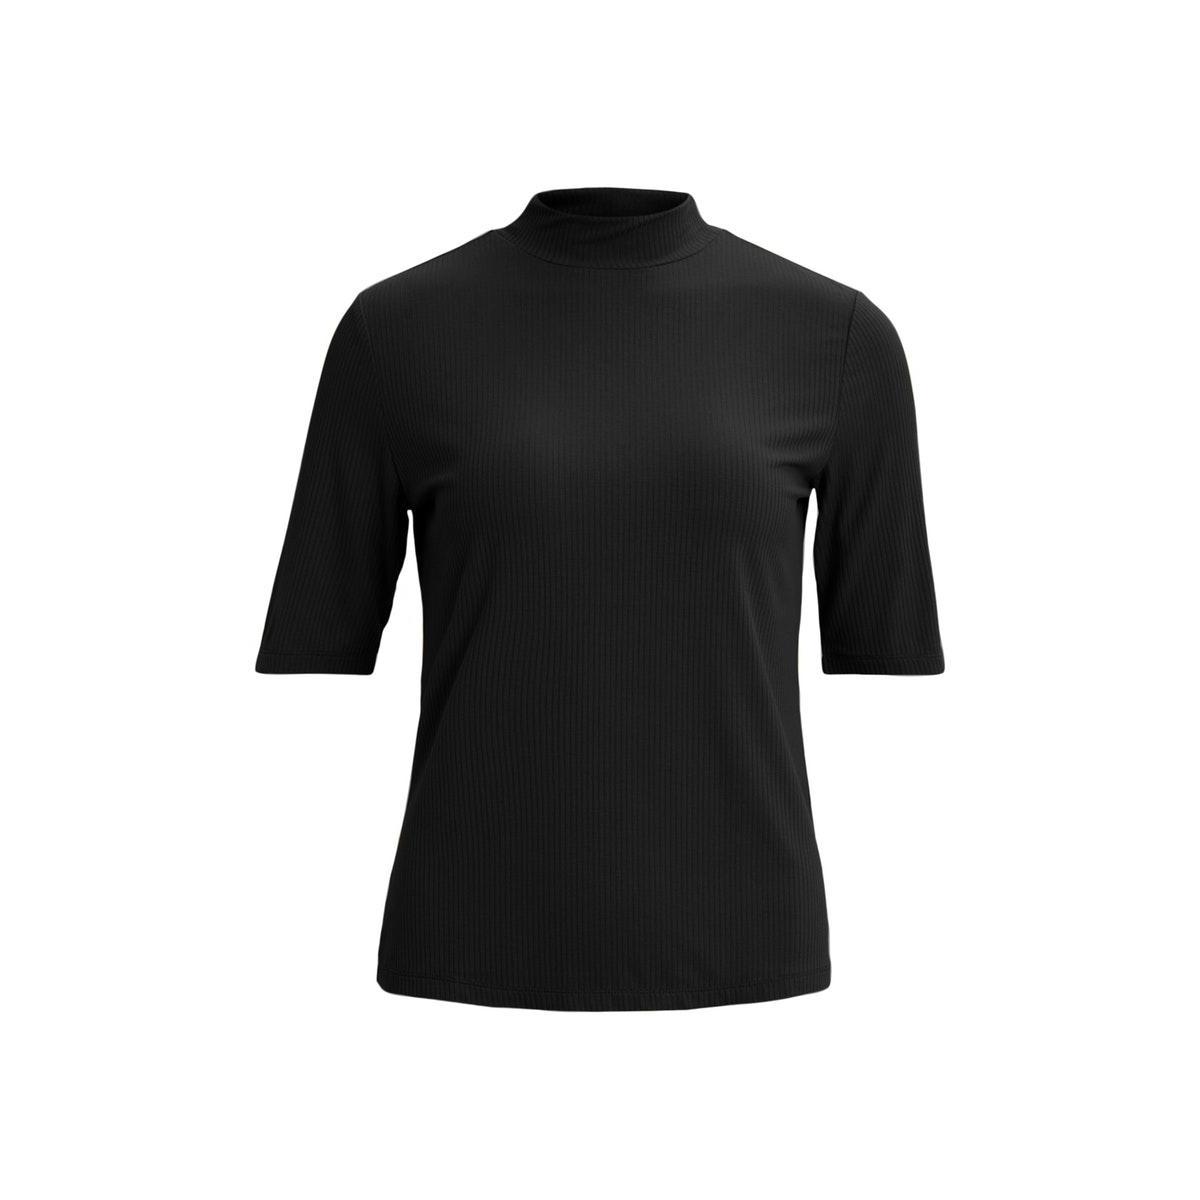 visolitta rib funnelneck 2/4 top/su 14056528 vila t-shirt black